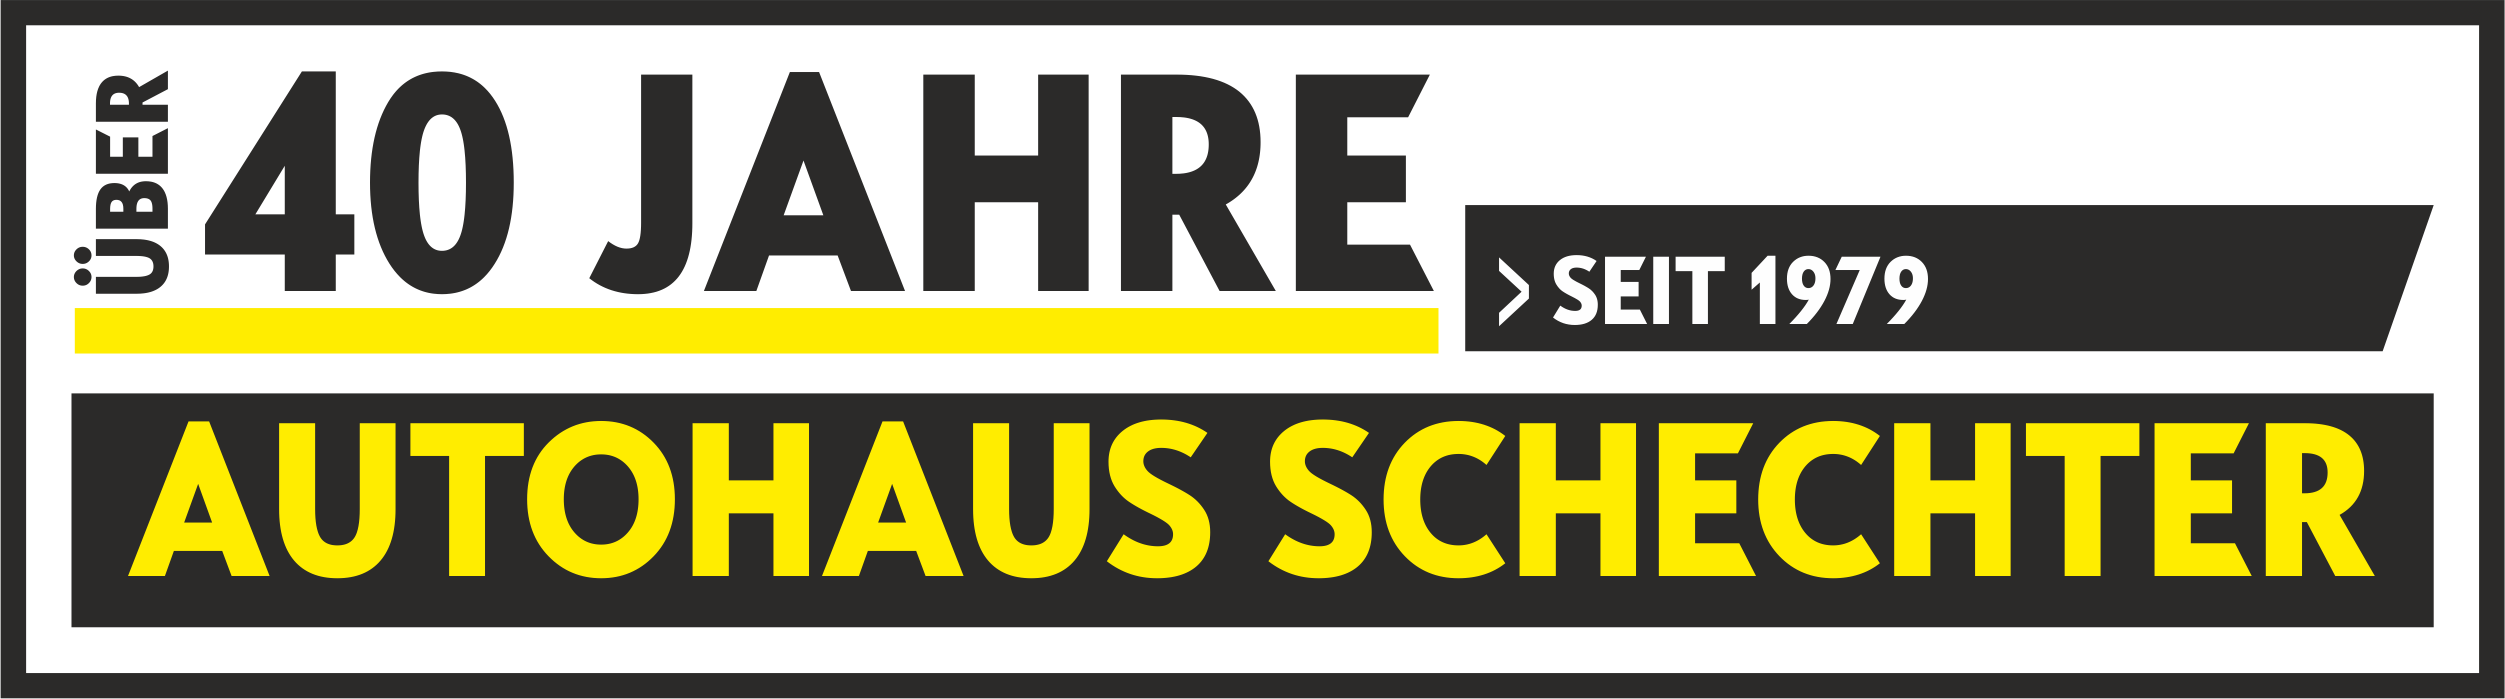 AUTOHAUS SCHECHTER GMBH & CO. KG